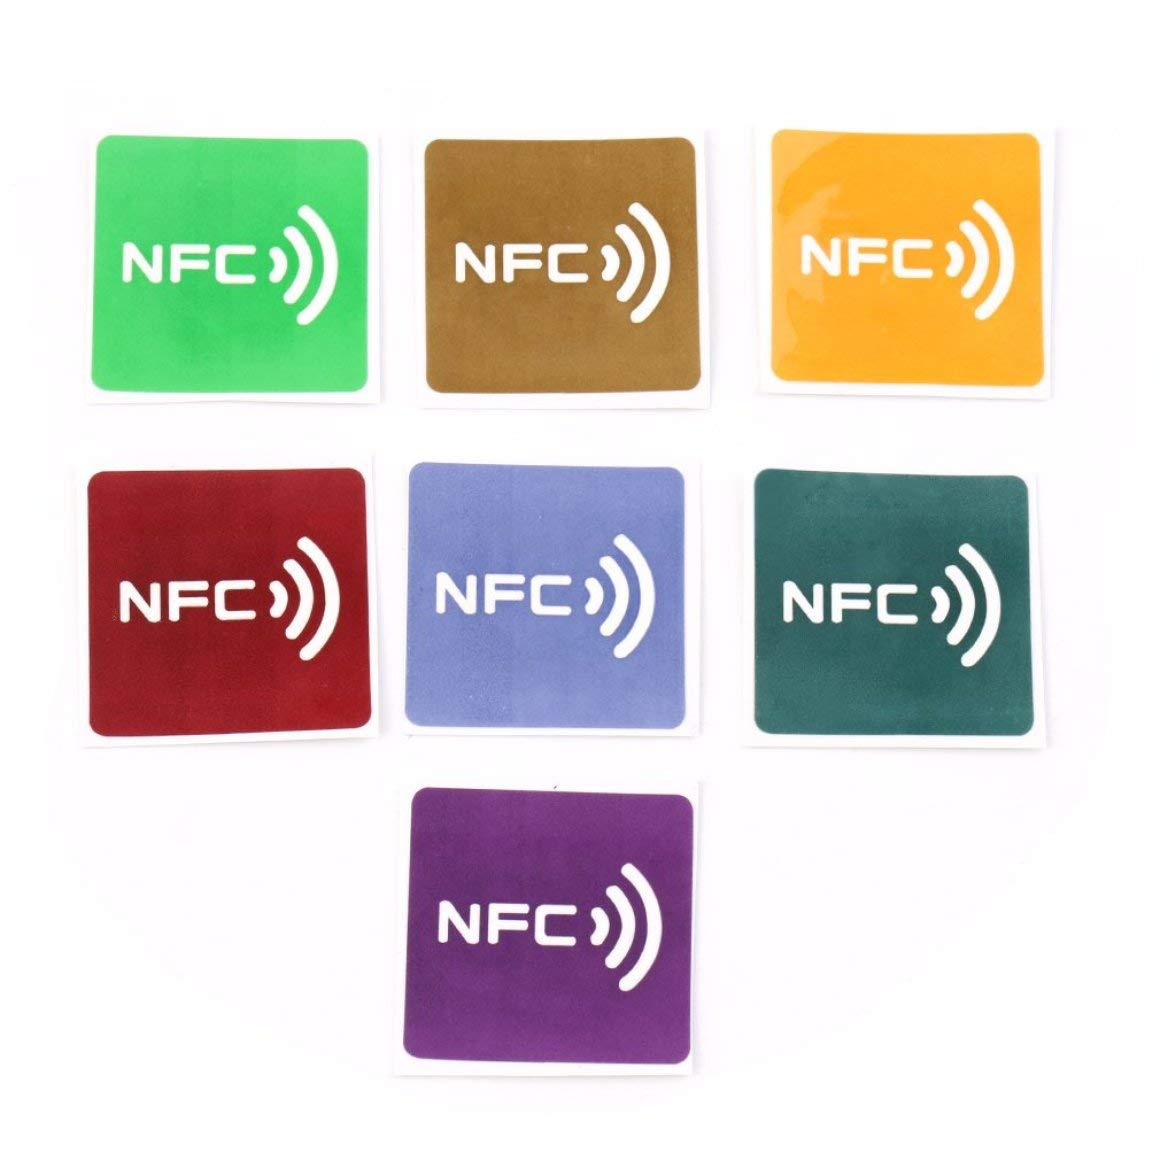 Funnyrunstore 7pcs Universal NFC Tag Multicolor Square NFC Tag Lables adesivi per dispositivo NFC-Wholesale